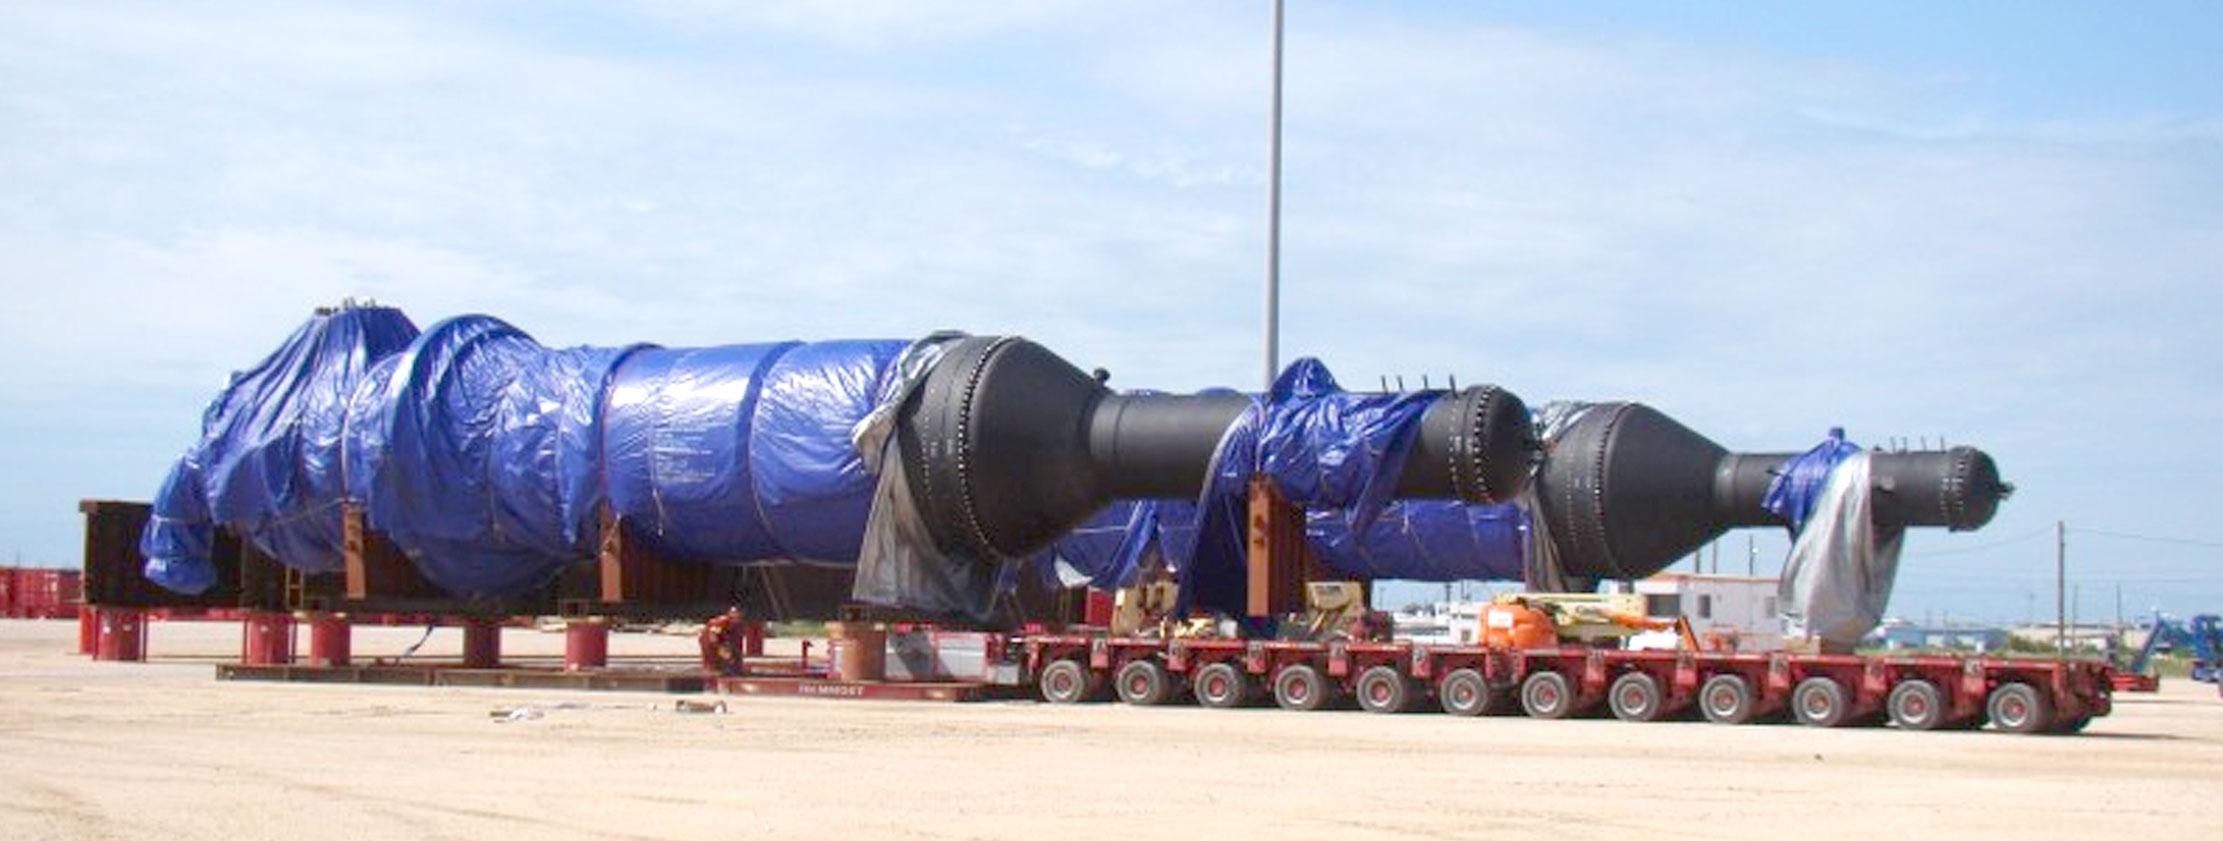 breakbulk project cargo port freeport